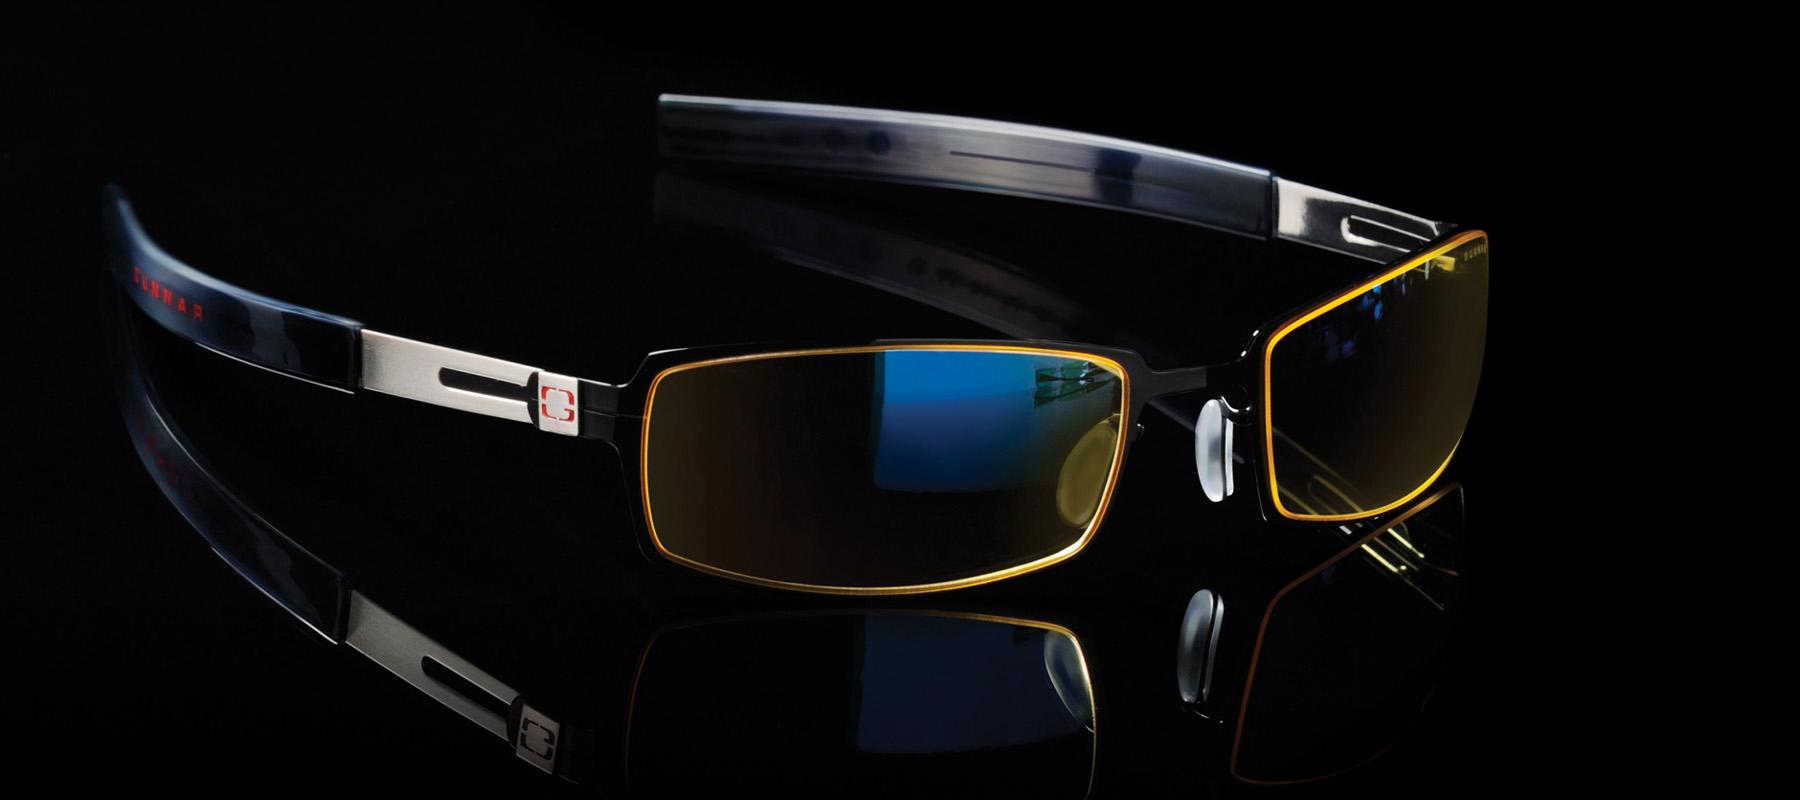 Deyvid Petteys/GUNNAR Glasses Giveaway